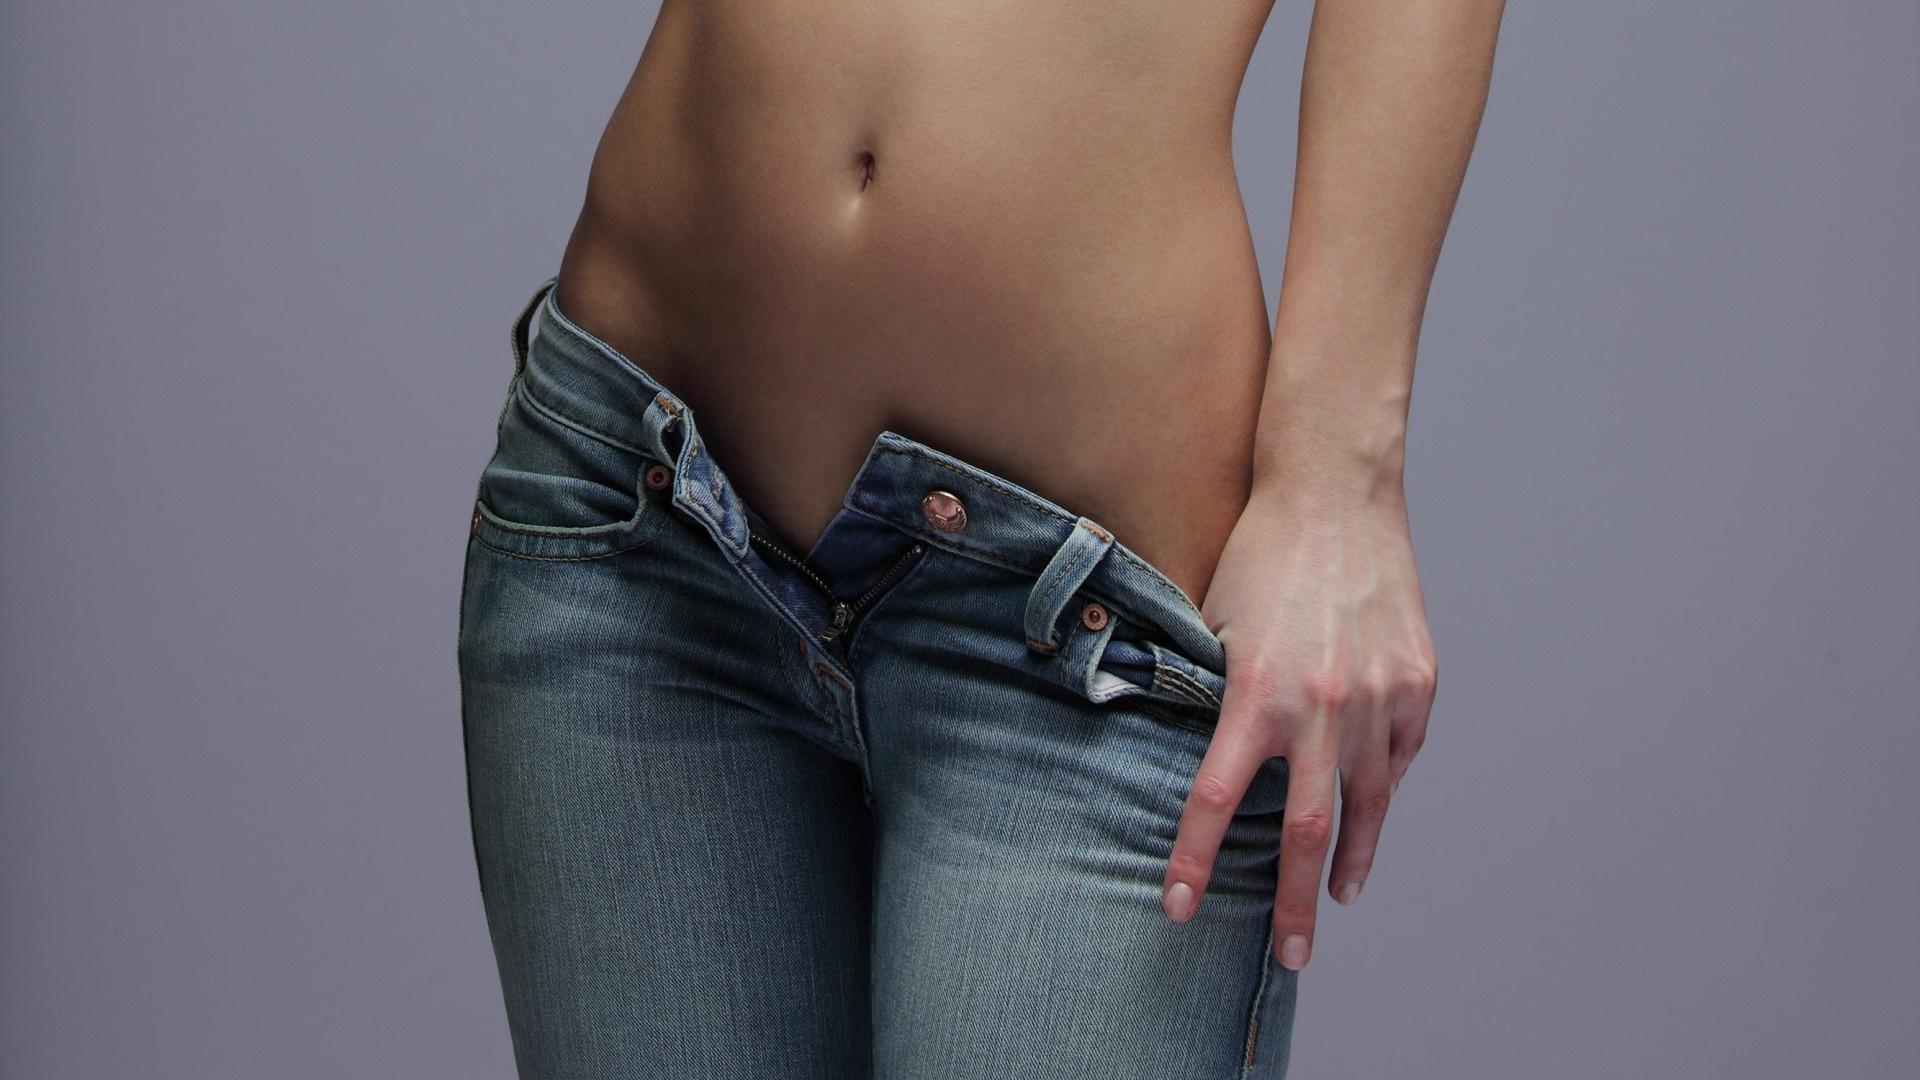 Снимает джинси фото 9 фотография